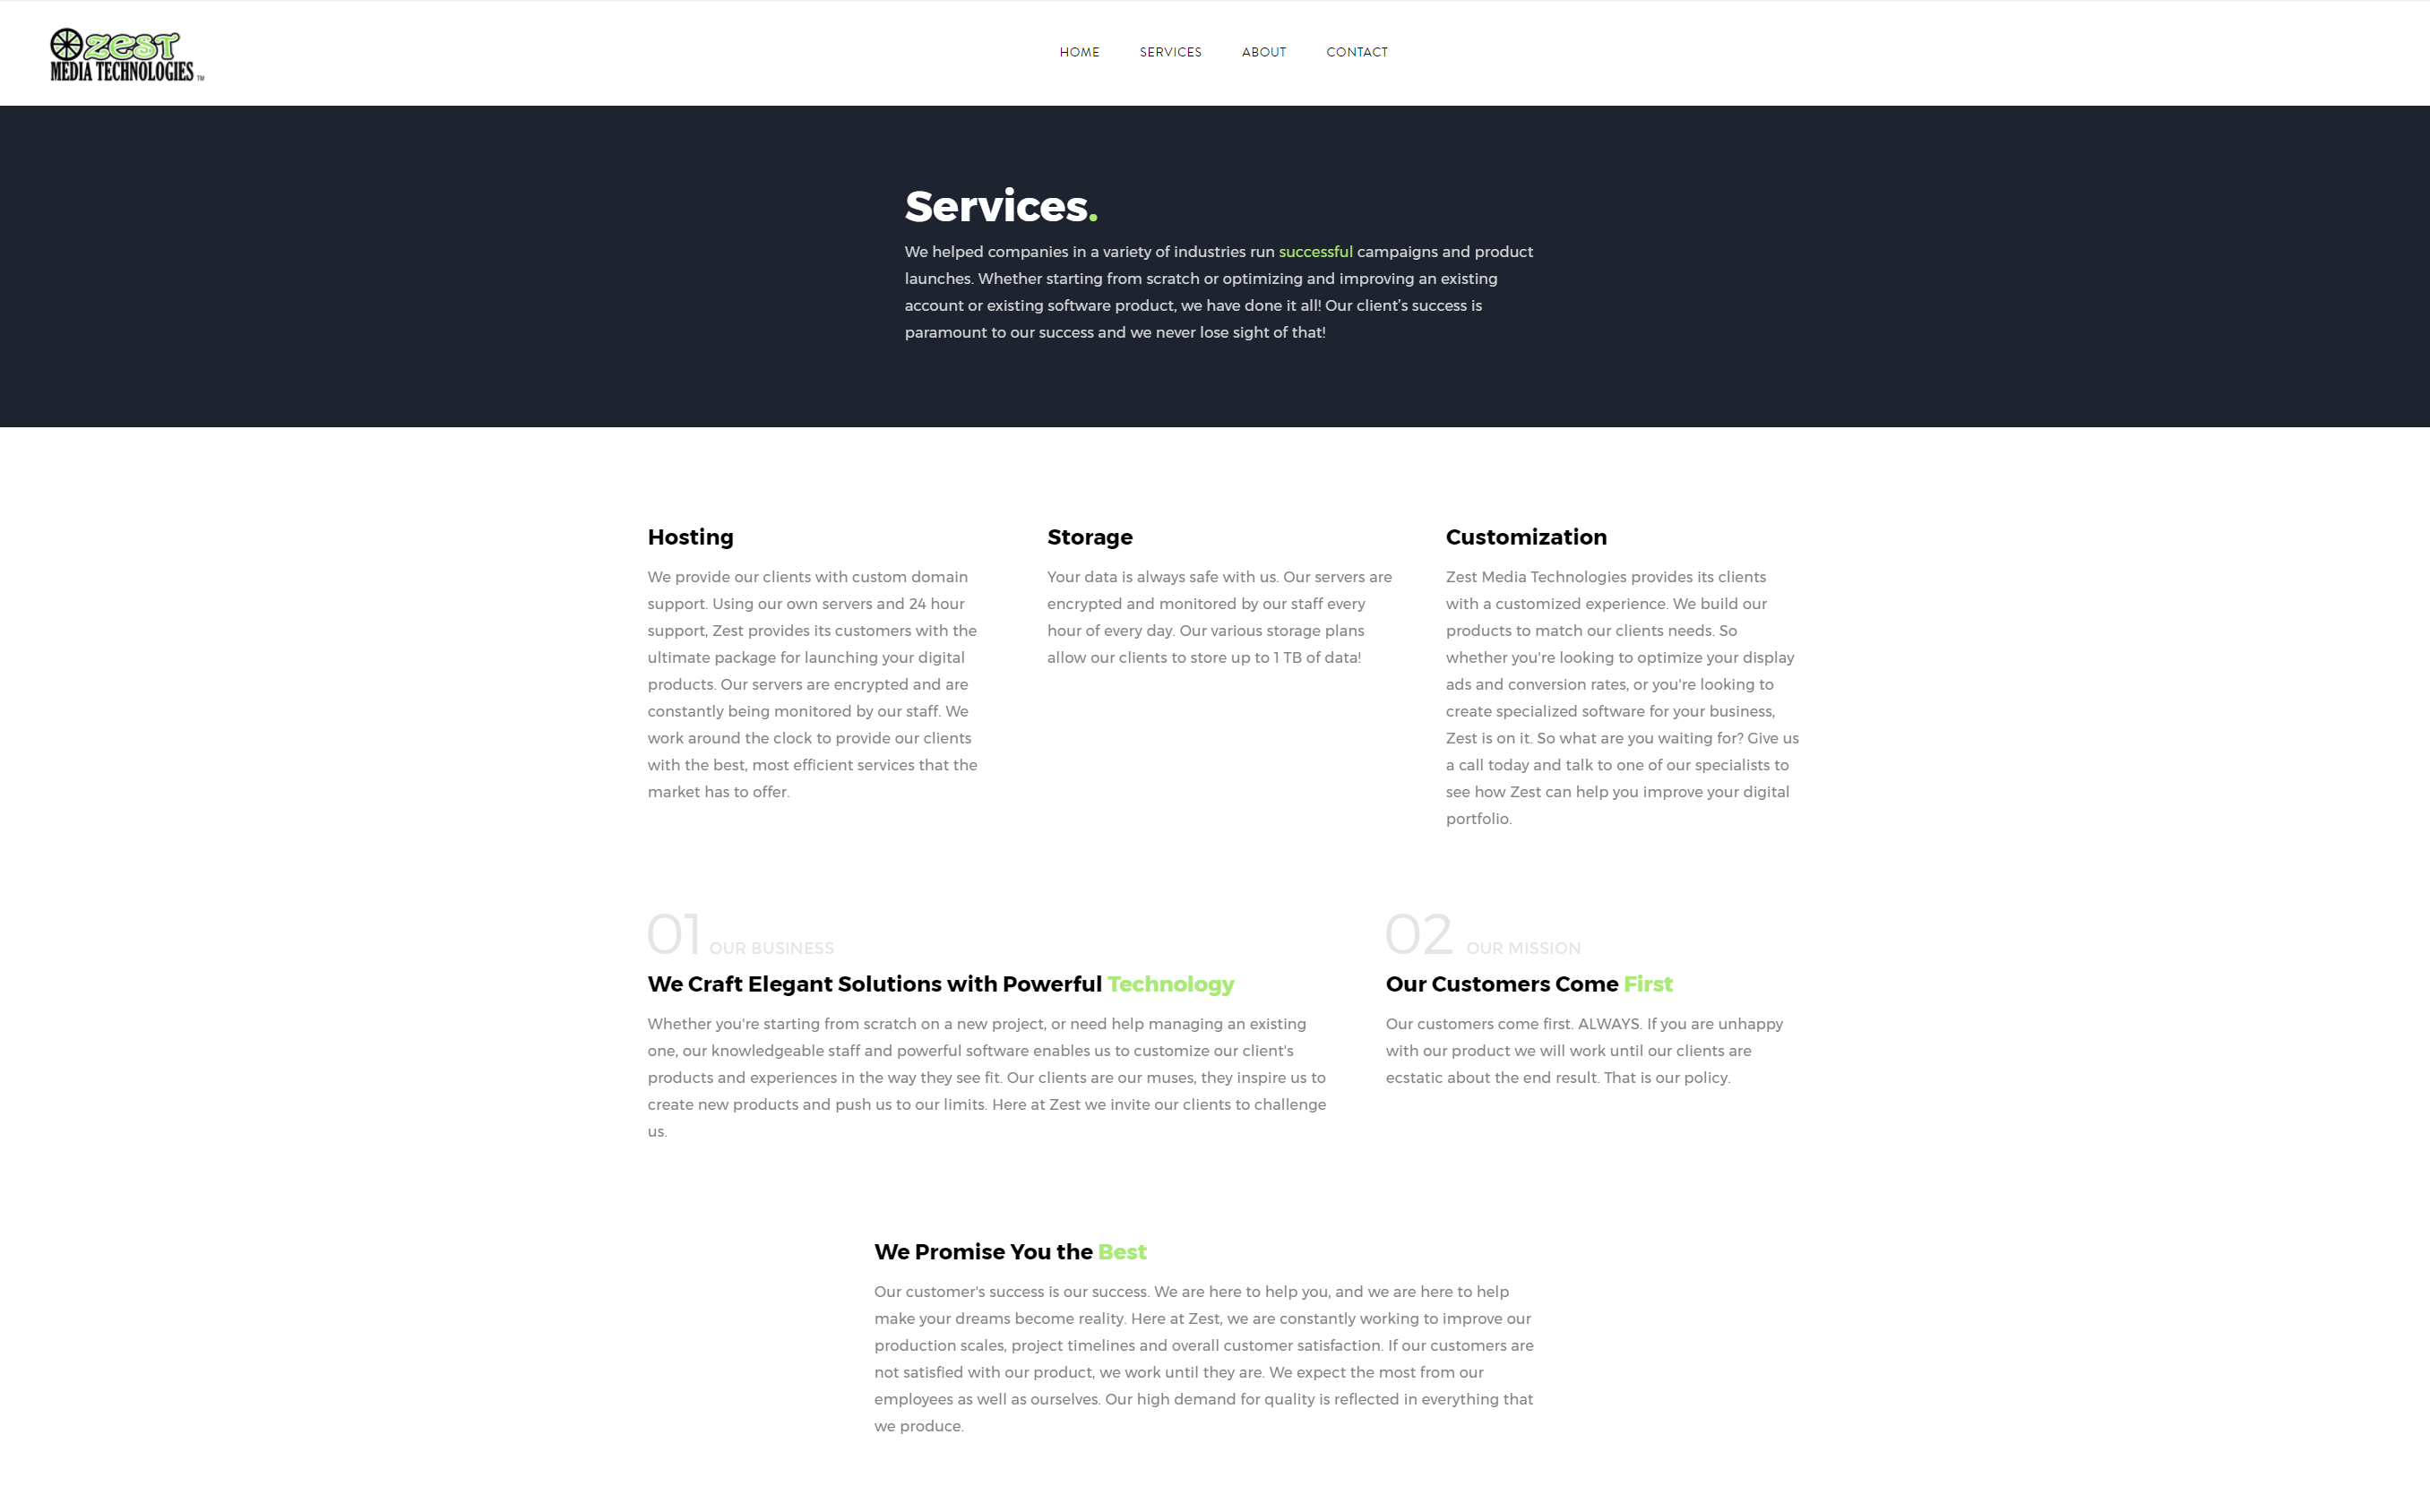 Zest Media Technologies Webpage Services